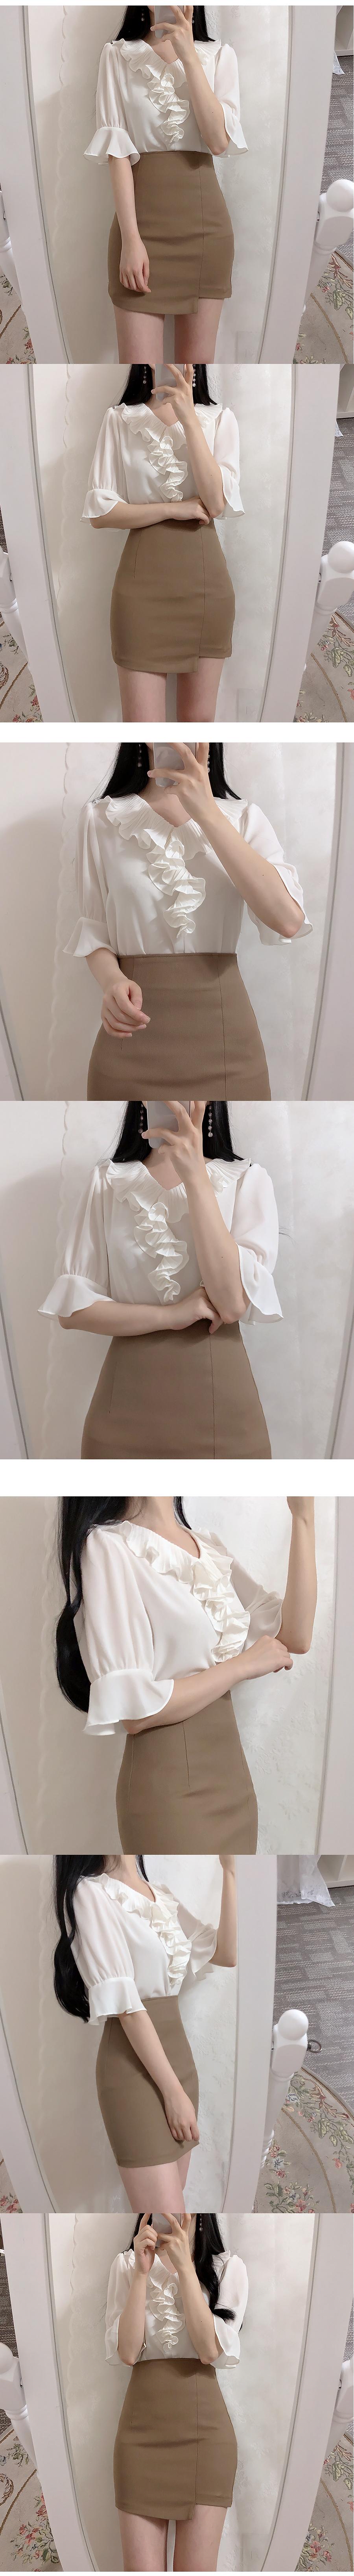 Slim Unhappy Mini Skirt